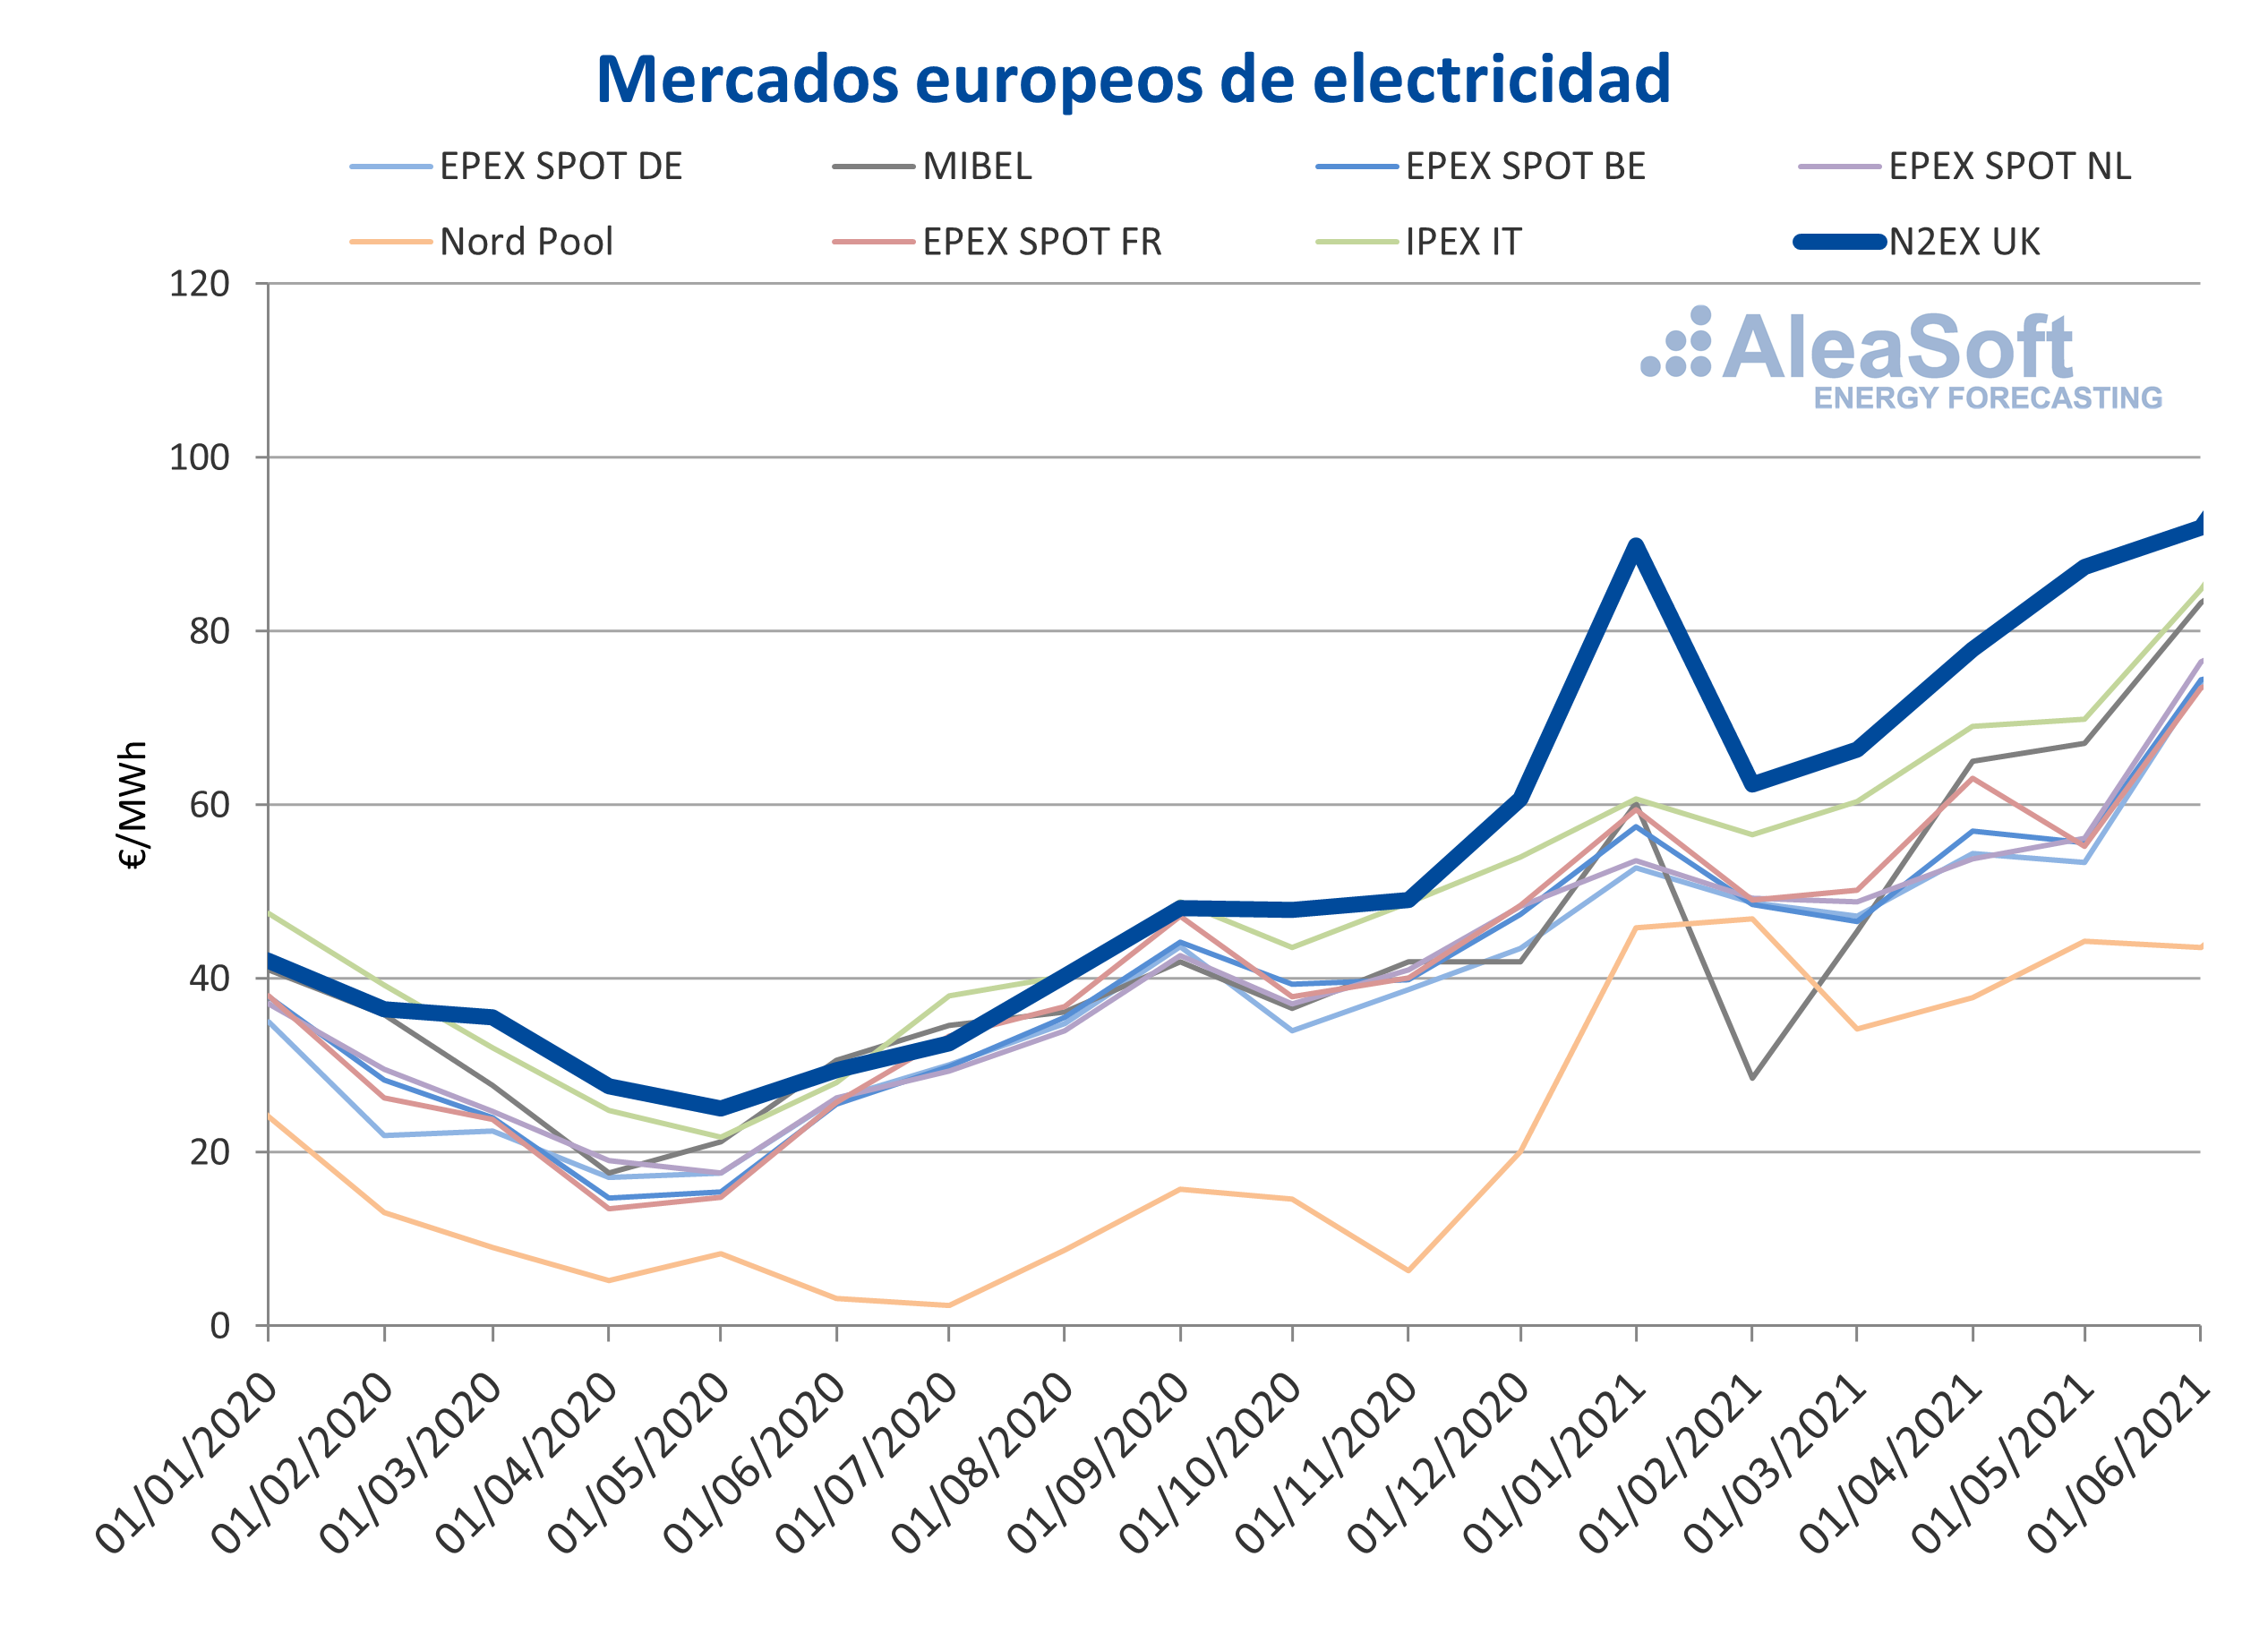 AleaSoft - Precios mercados electricos europeos n2ex uk